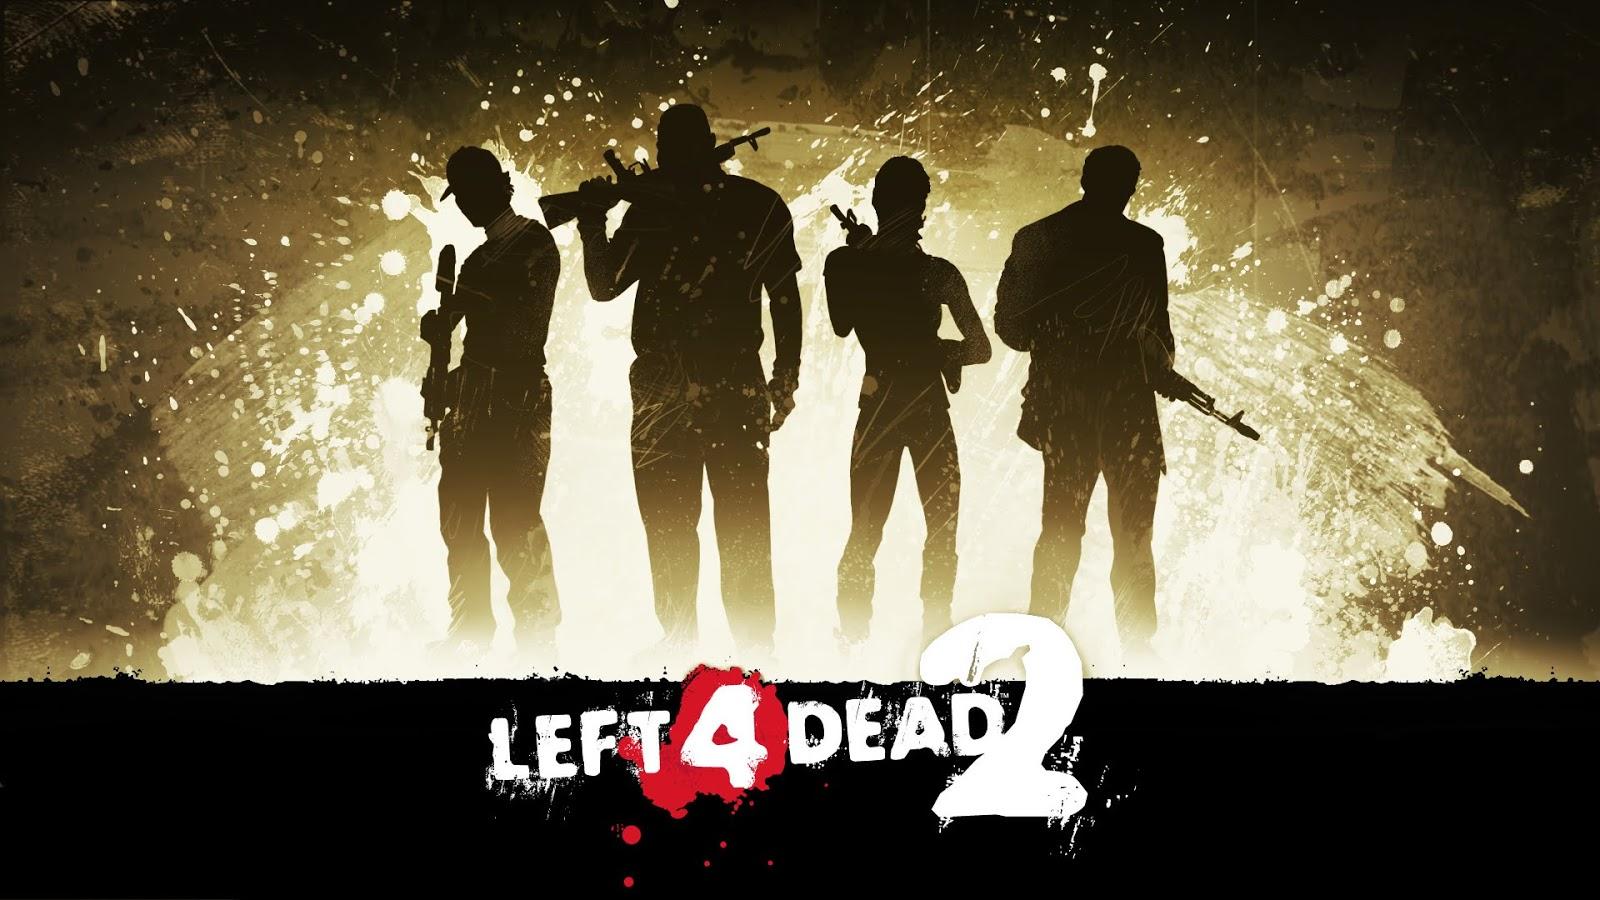 MAP: Left 4 Dead 2 MAP